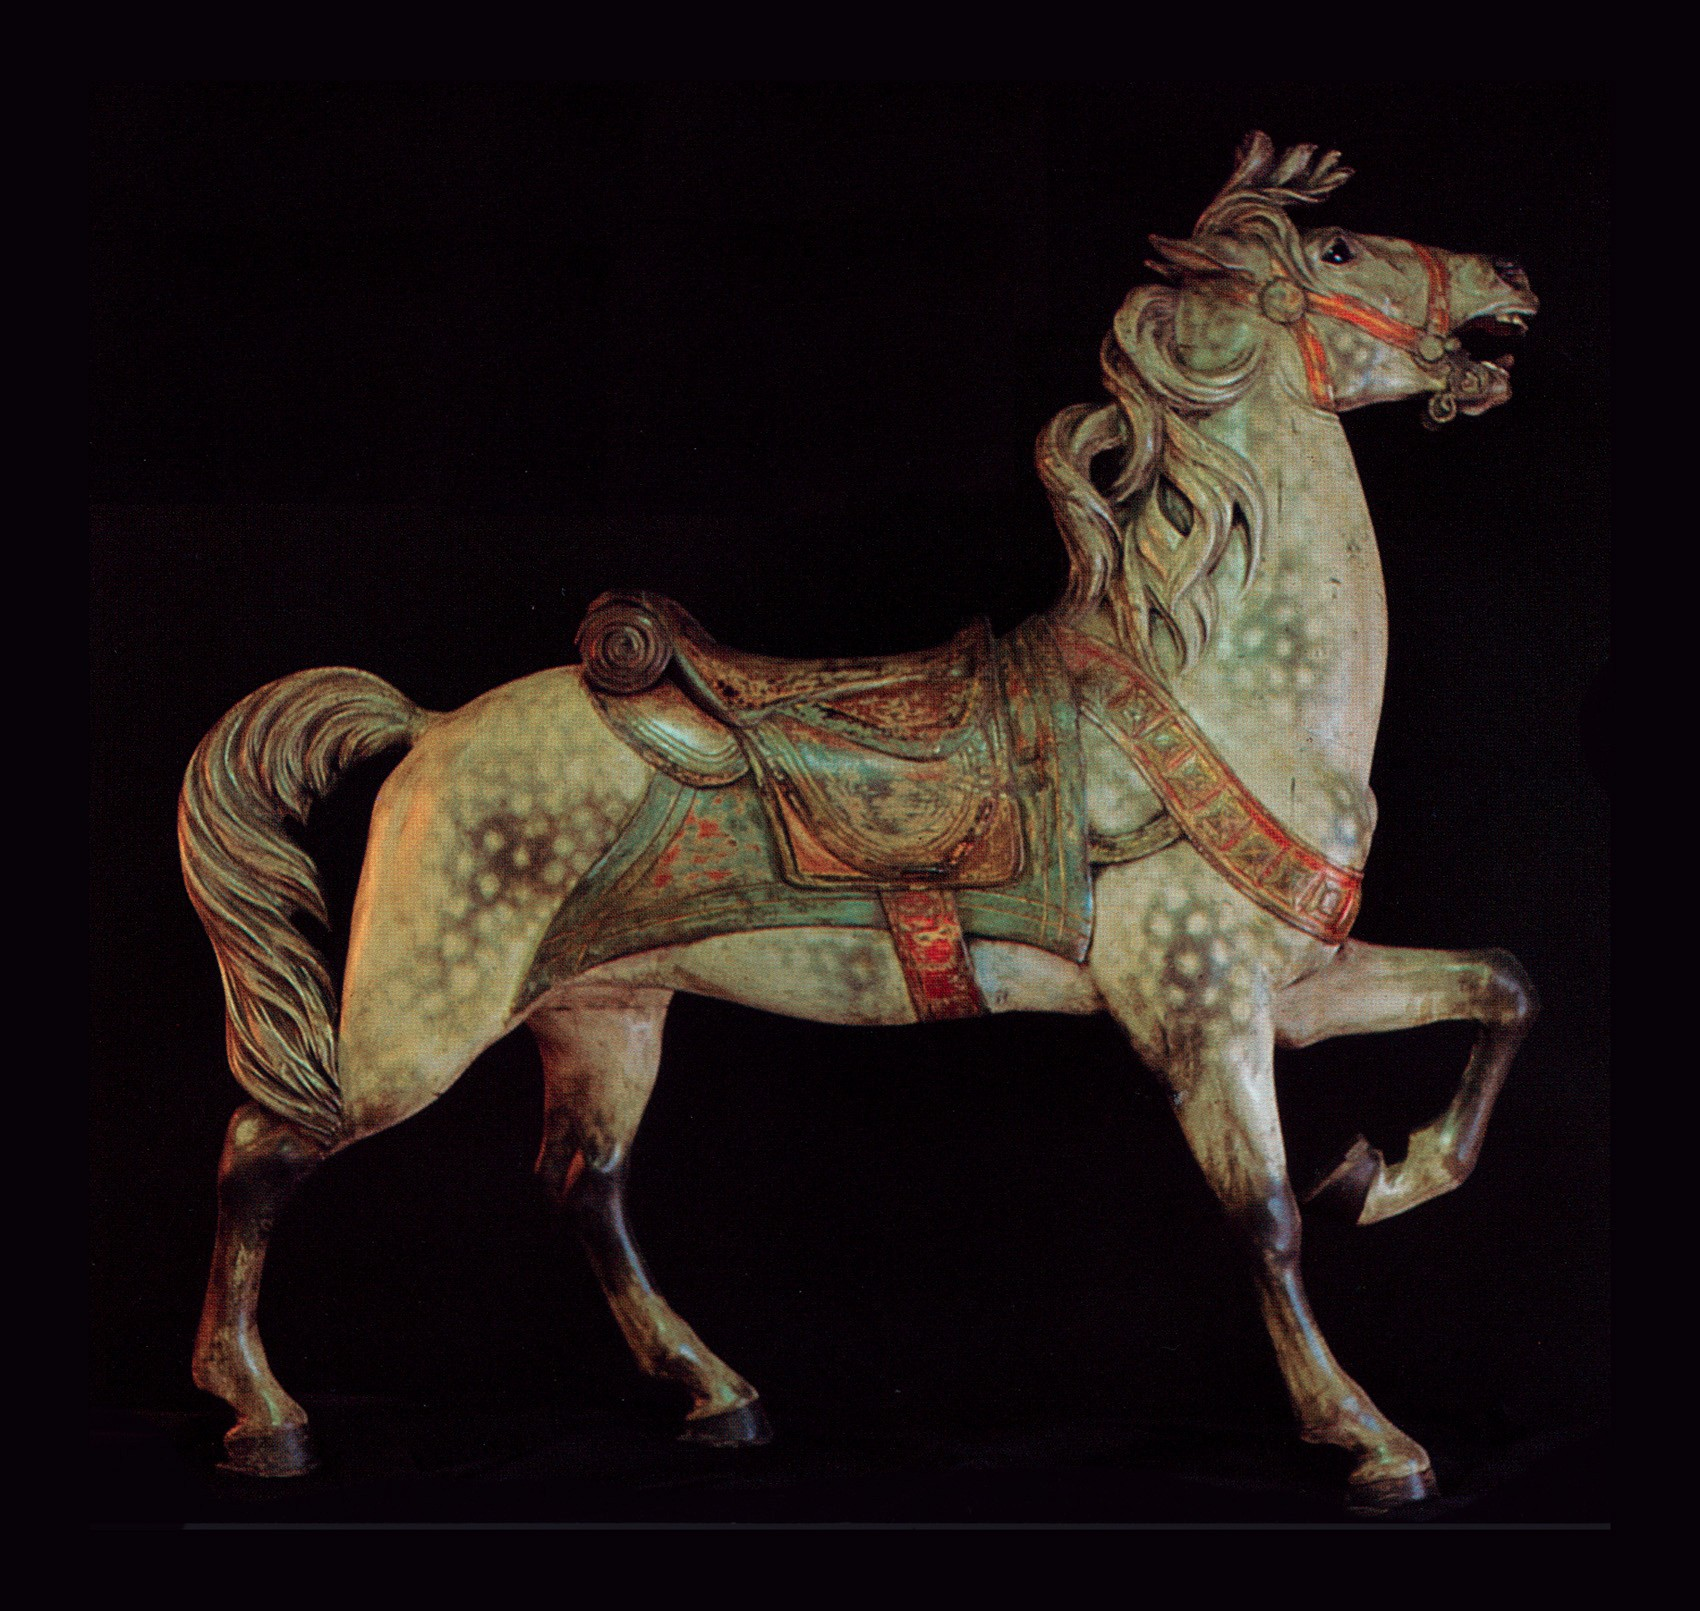 Original-paint-Muller-stander-carousel-horse